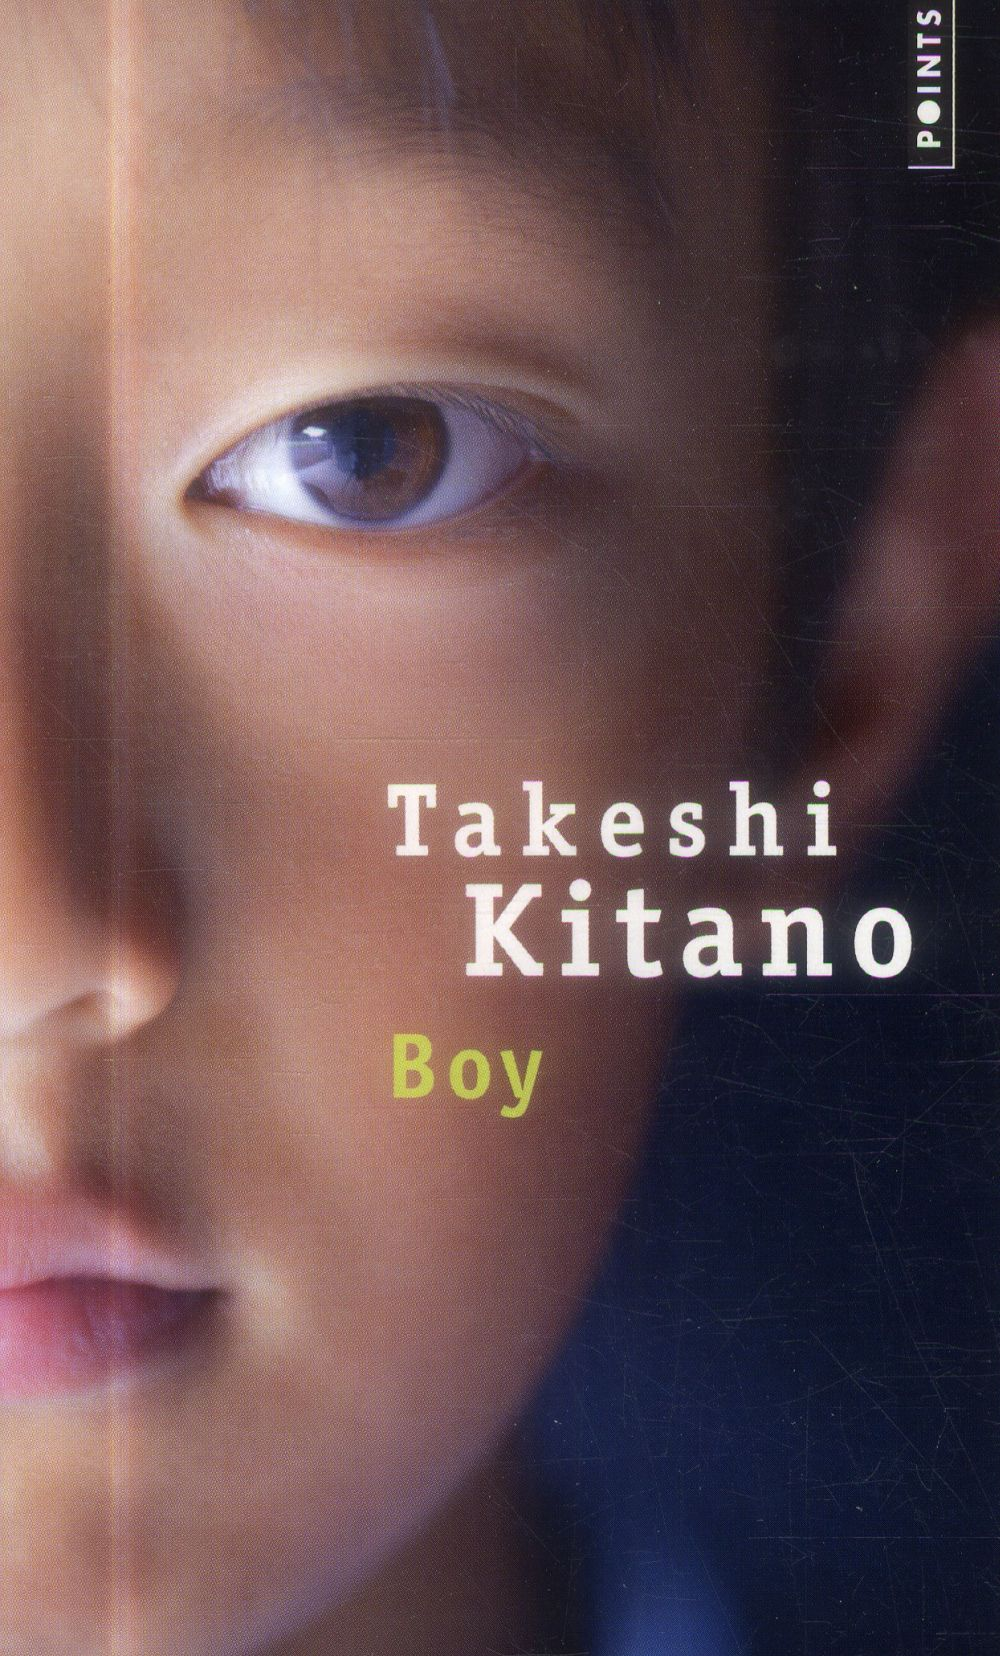 BOY Kitano Takeshi